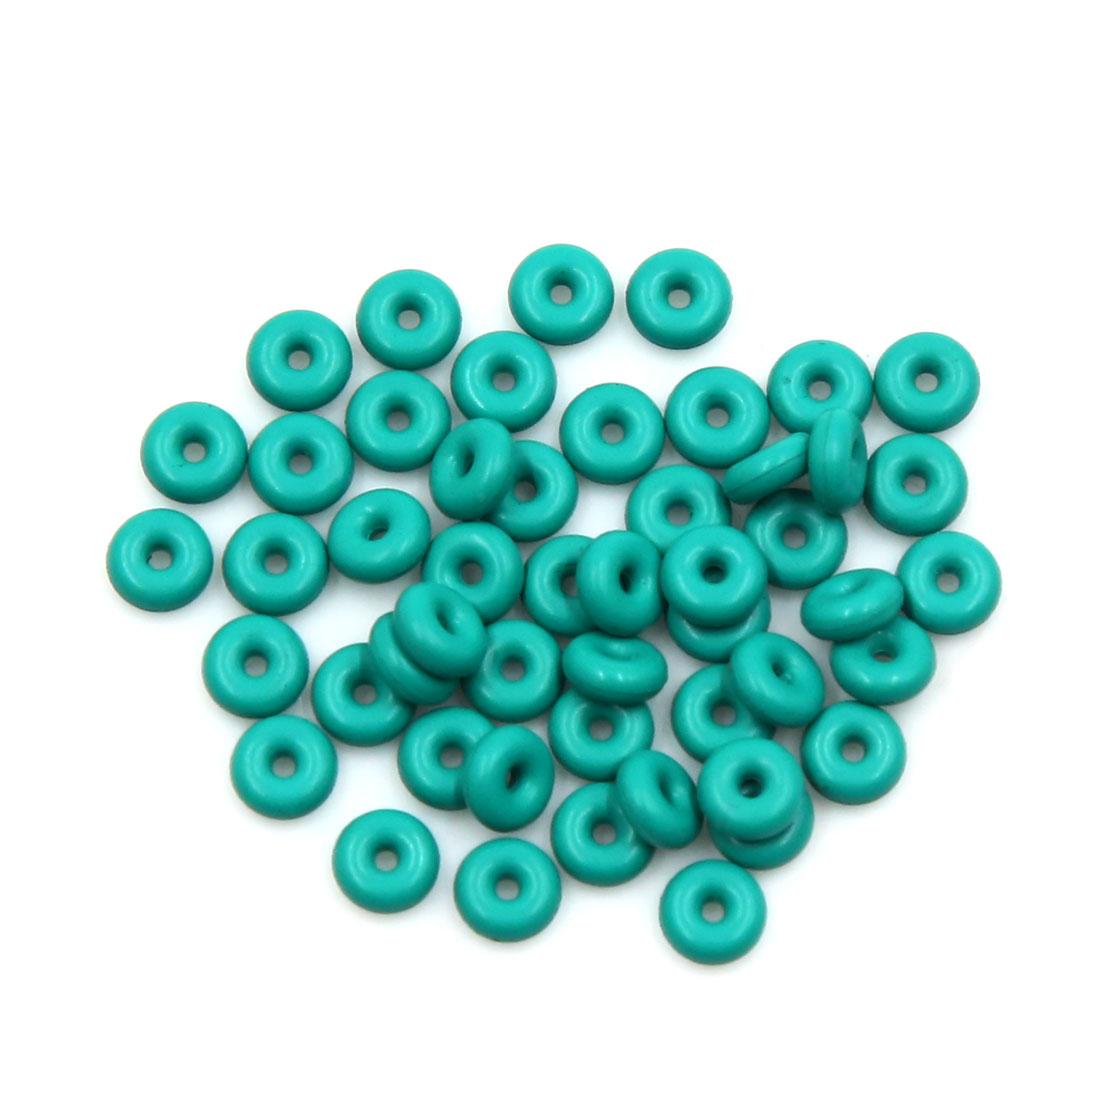 50pcs Green Universal FKM O-Ring Sealing Gasket Washer for Car 5mm x 2mm